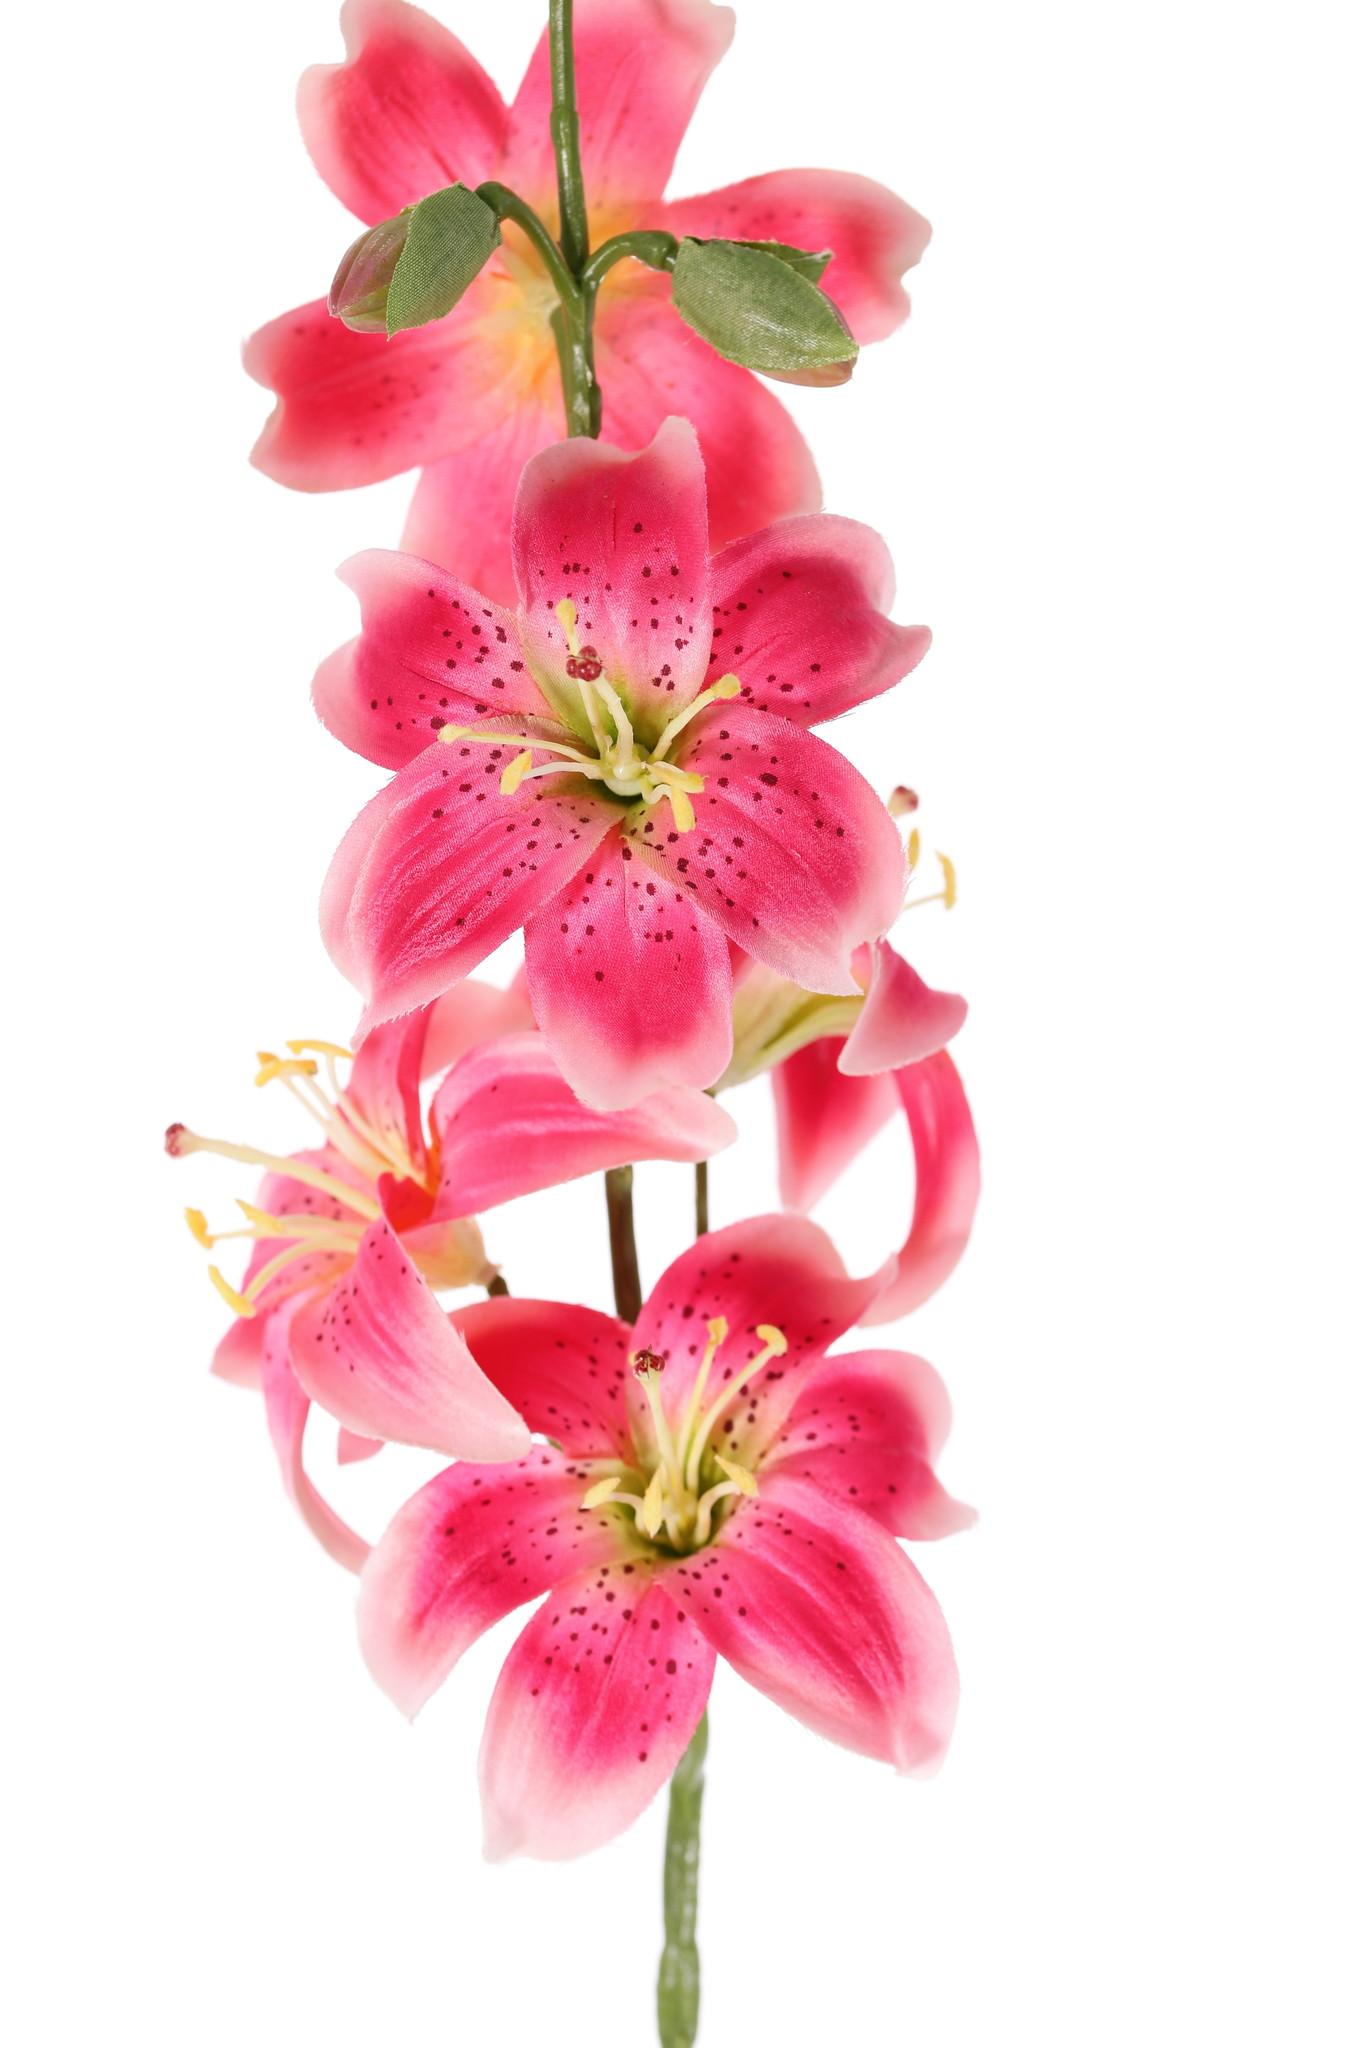 Lily (Lilium) with 5 flowers (Ø 8cm) & 4 buds, 64cm